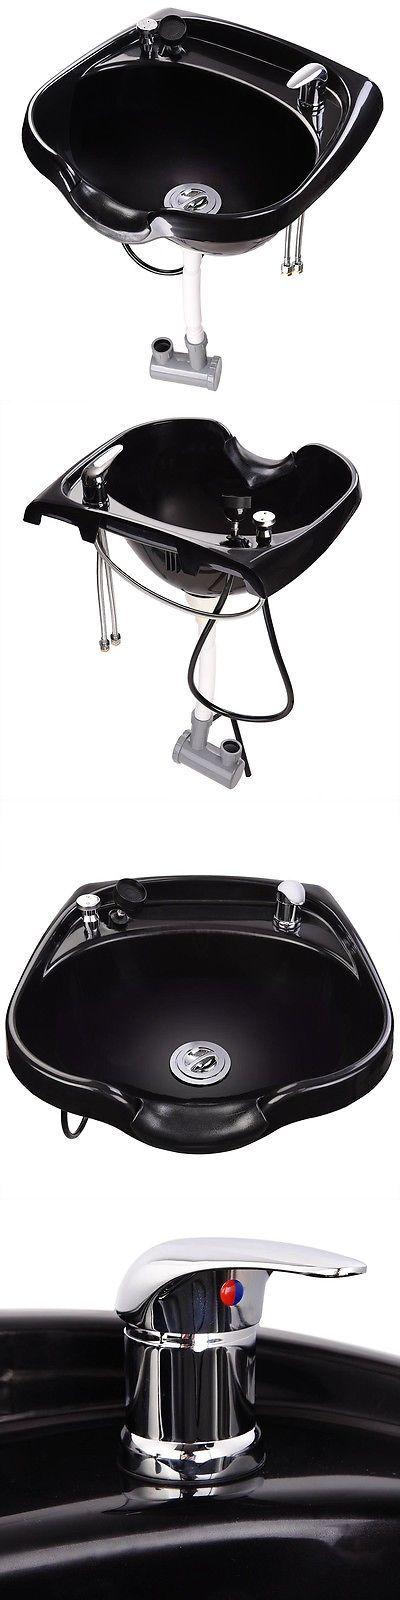 Backwash Units and Shampoo Bowls: Shampoo Plastic Bowl Hair Sink Barber Basin Beauty Salon Spa Equipment Hair Cut BUY IT NOW ONLY: $65.9